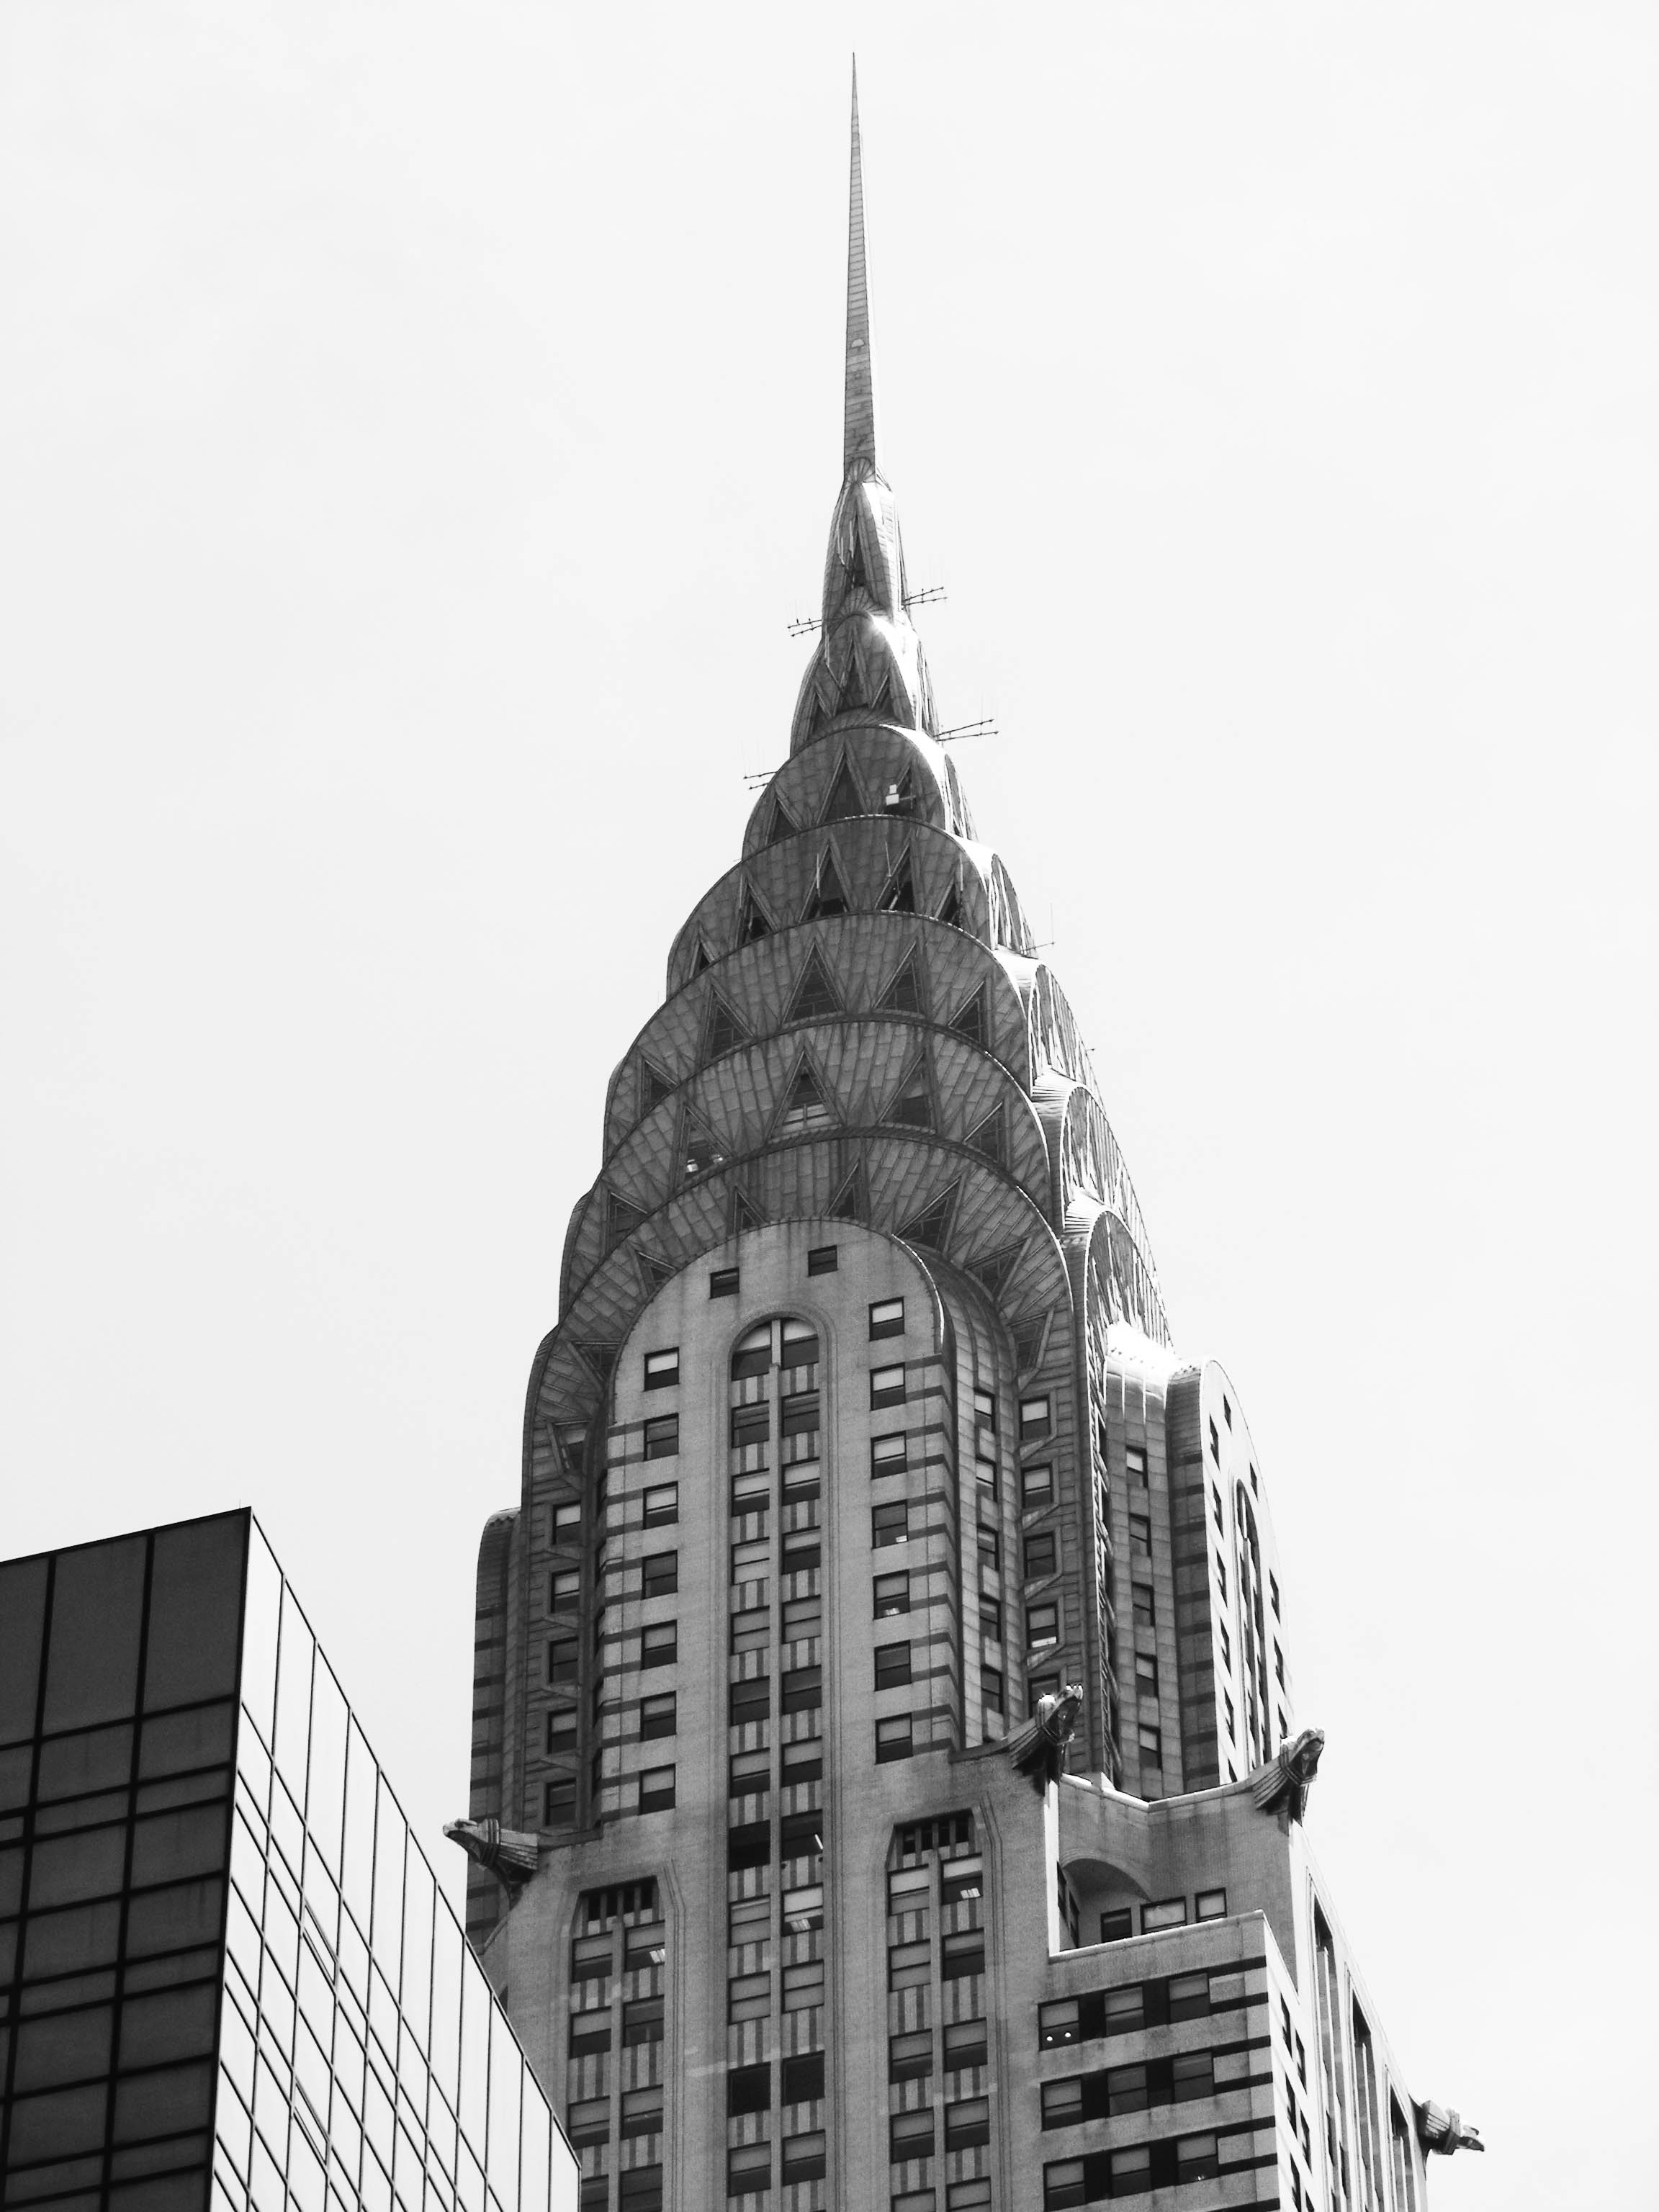 Chrysler Building New York City Skyscraper A Storytelling Home Lea Plourde Archer